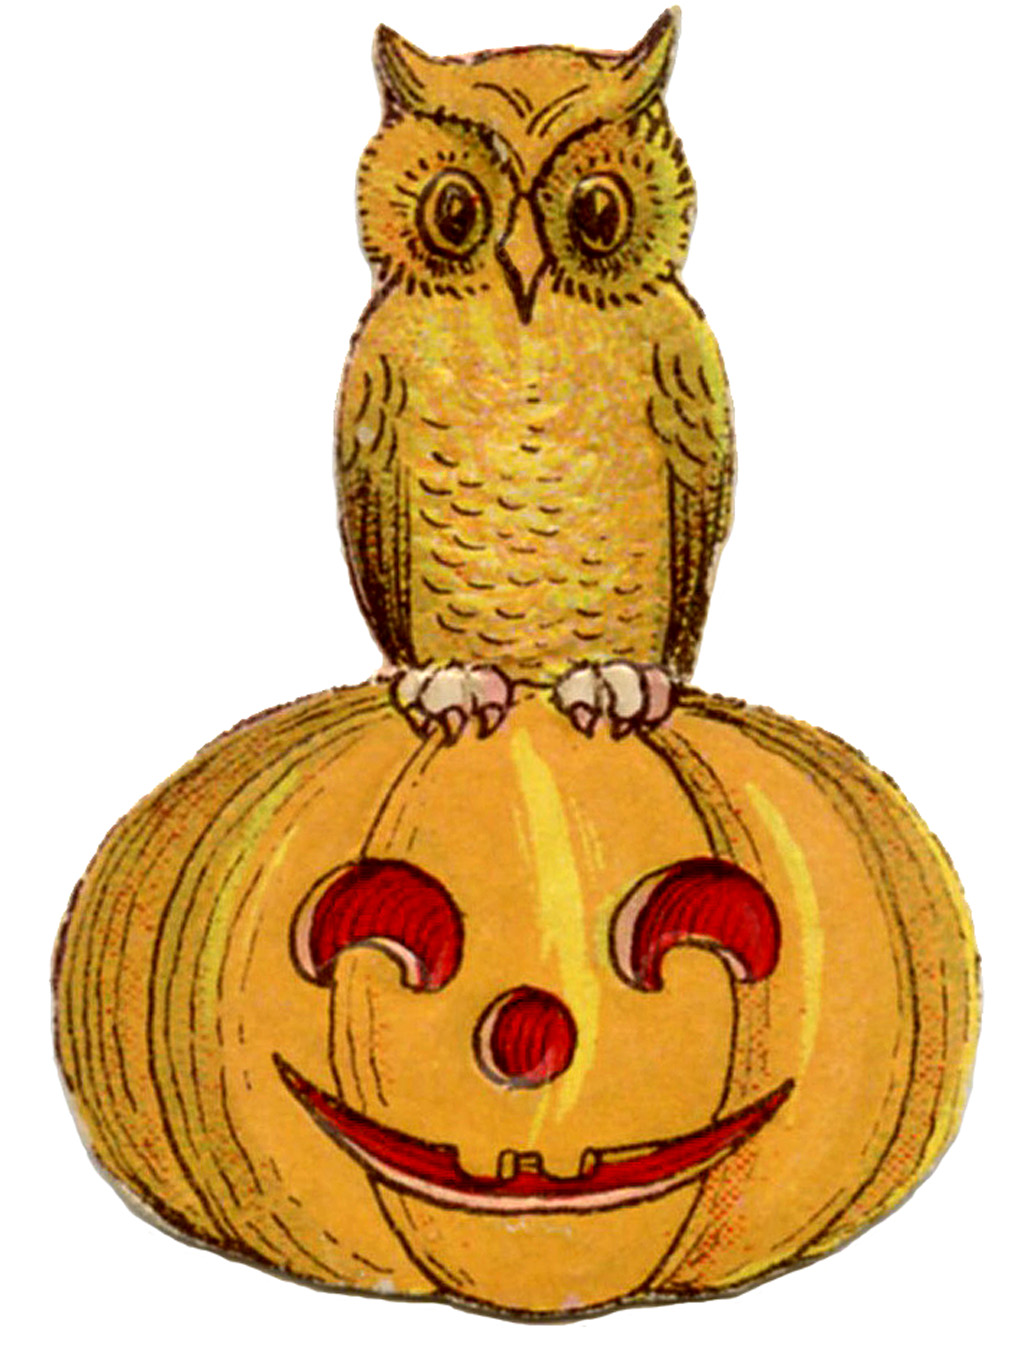 Vintage clipart halloween clip free stock Vintage Halloween Clip Art - Cute Owl on Pumpkin - The Graphics Fairy clip free stock